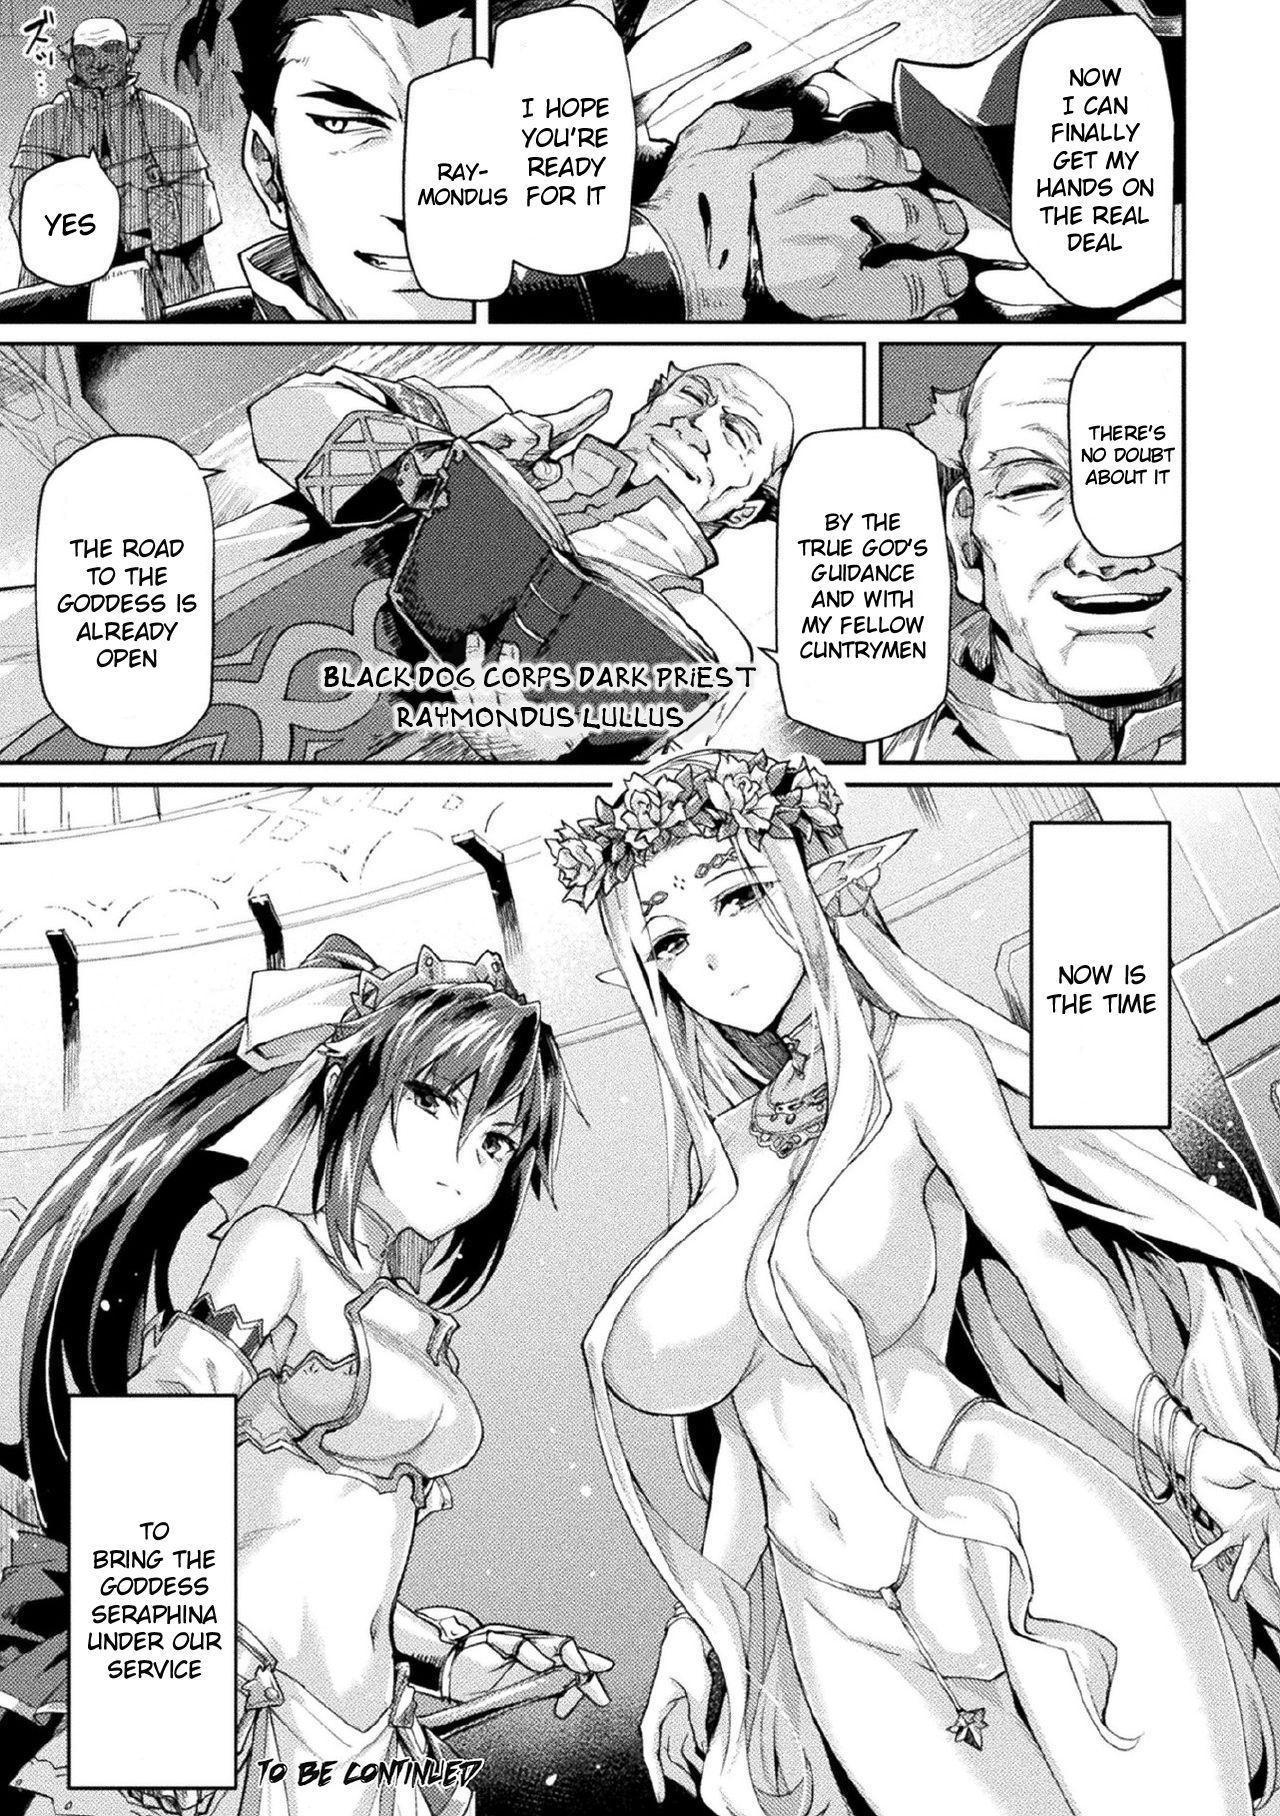 [Tsukitokage] Kuroinu II ~Inyoku ni Somaru Haitoku no Miyako, Futatabi~ THE COMIC Chapter 6 (Kukkoro Heroines Vol. 7) [English] [Klub Kemoner] [Decensored] [Digital] 21